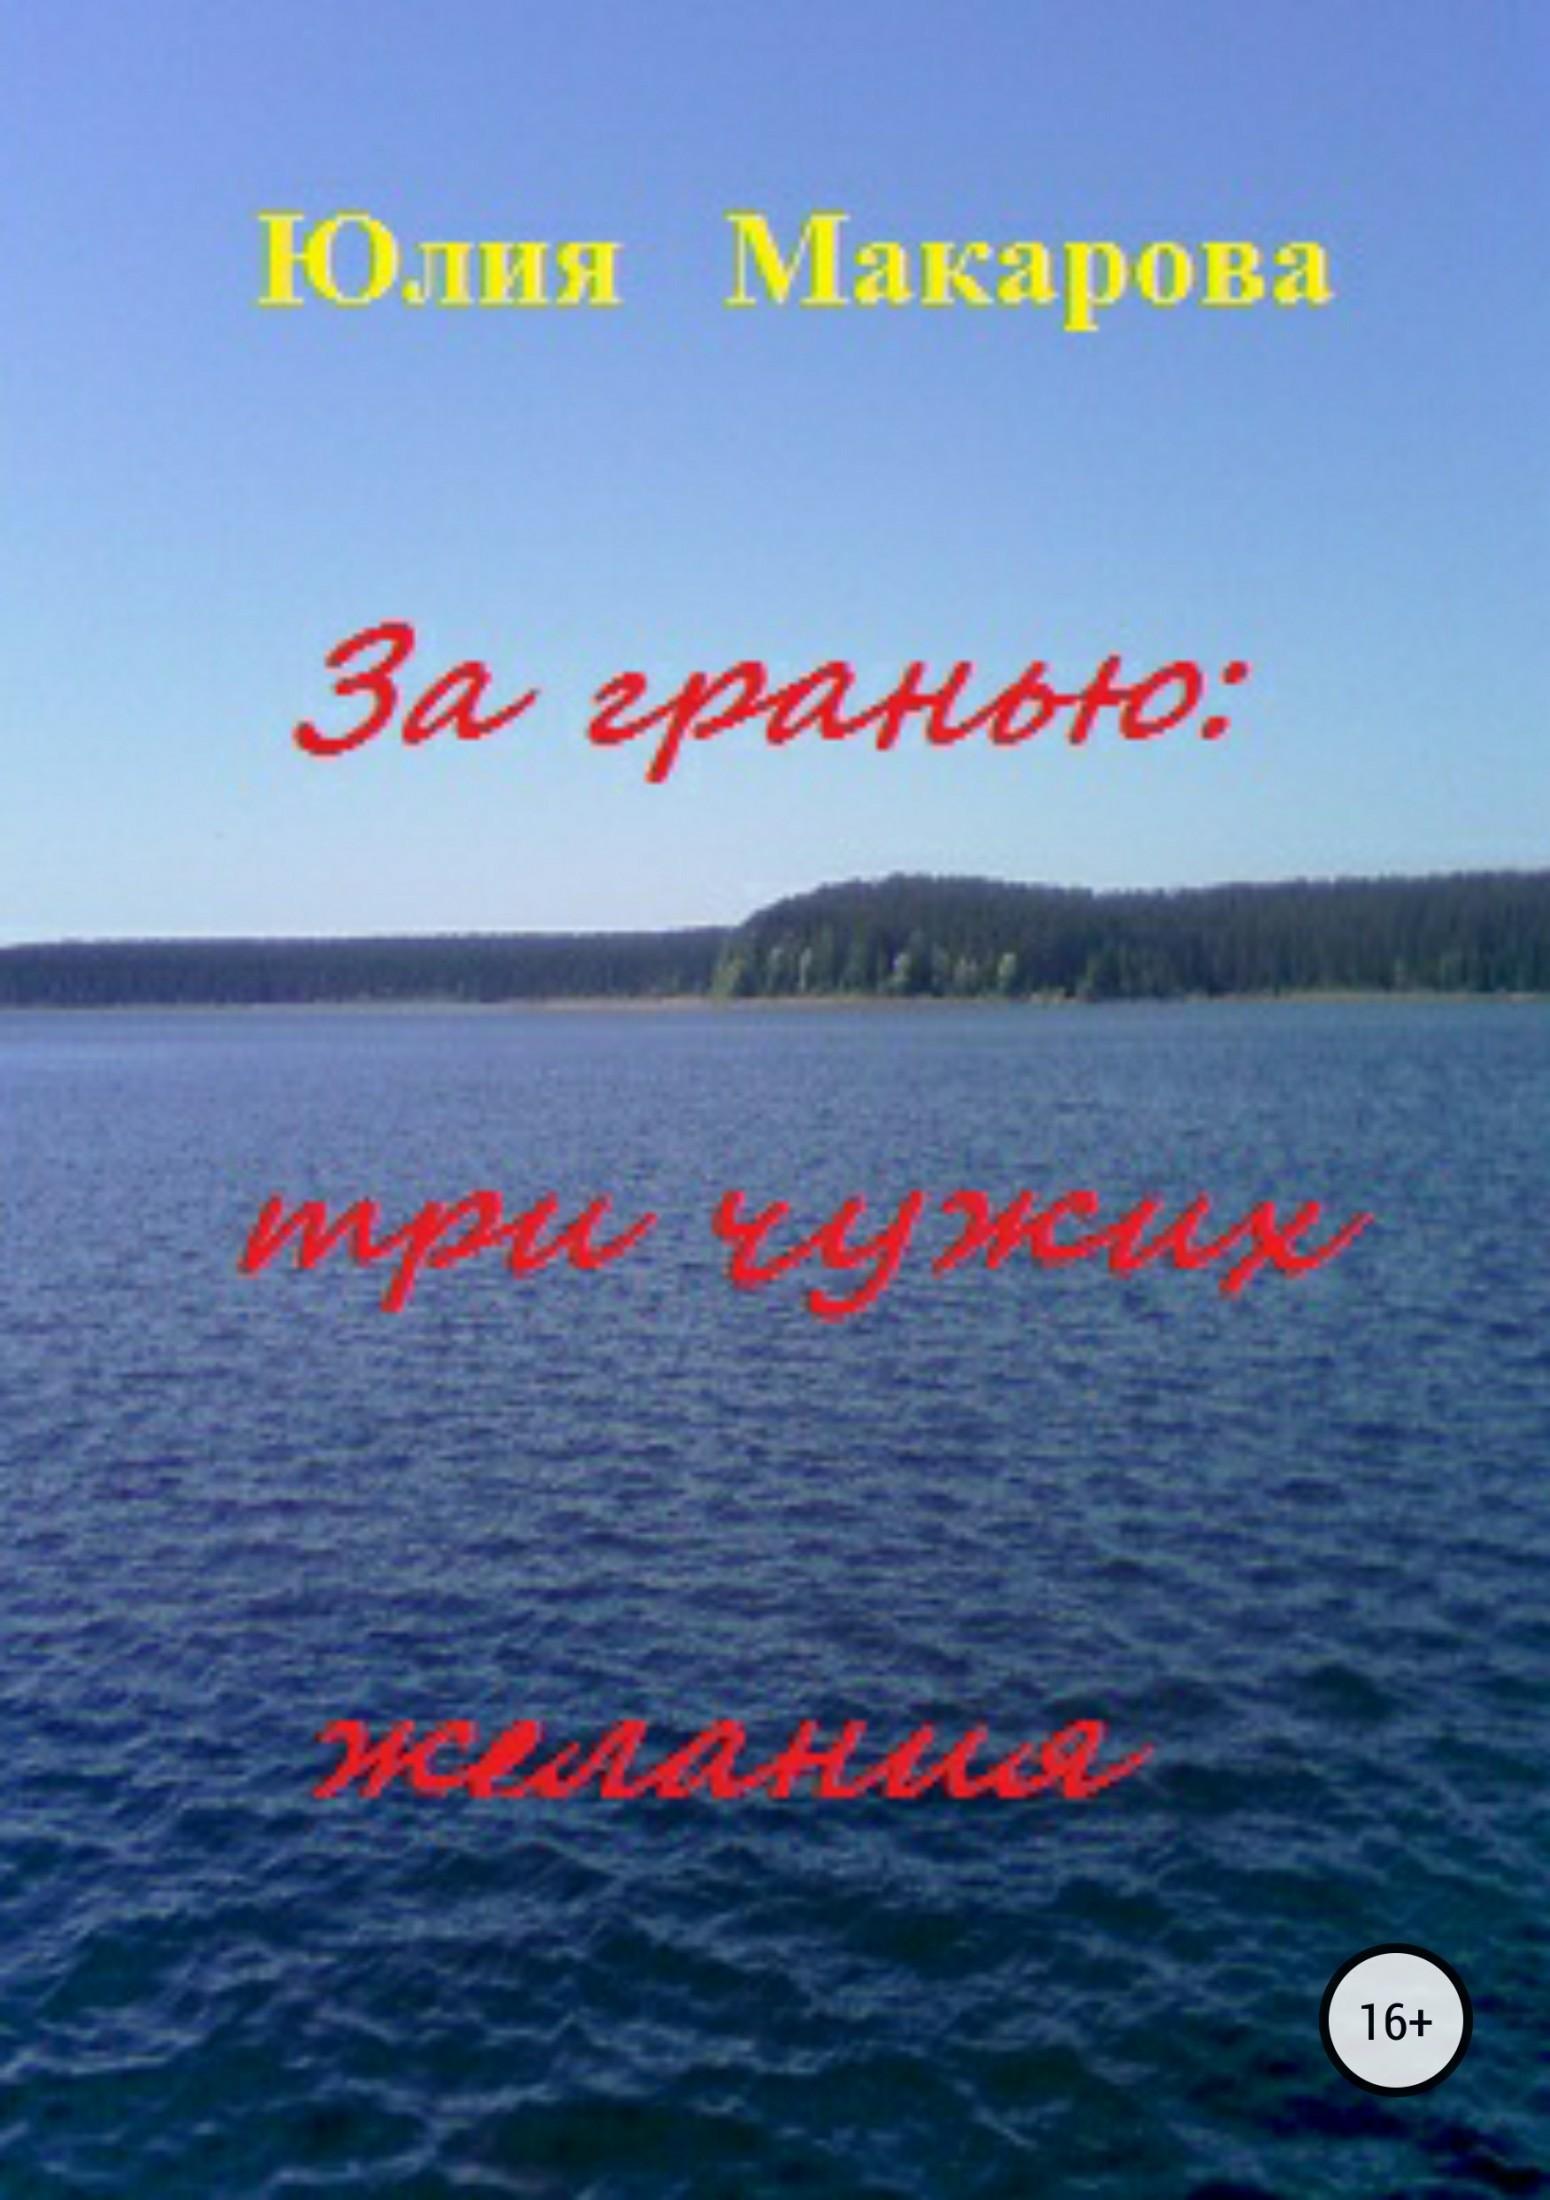 все цены на Юлия Макарова За гранью: три чужих желания онлайн